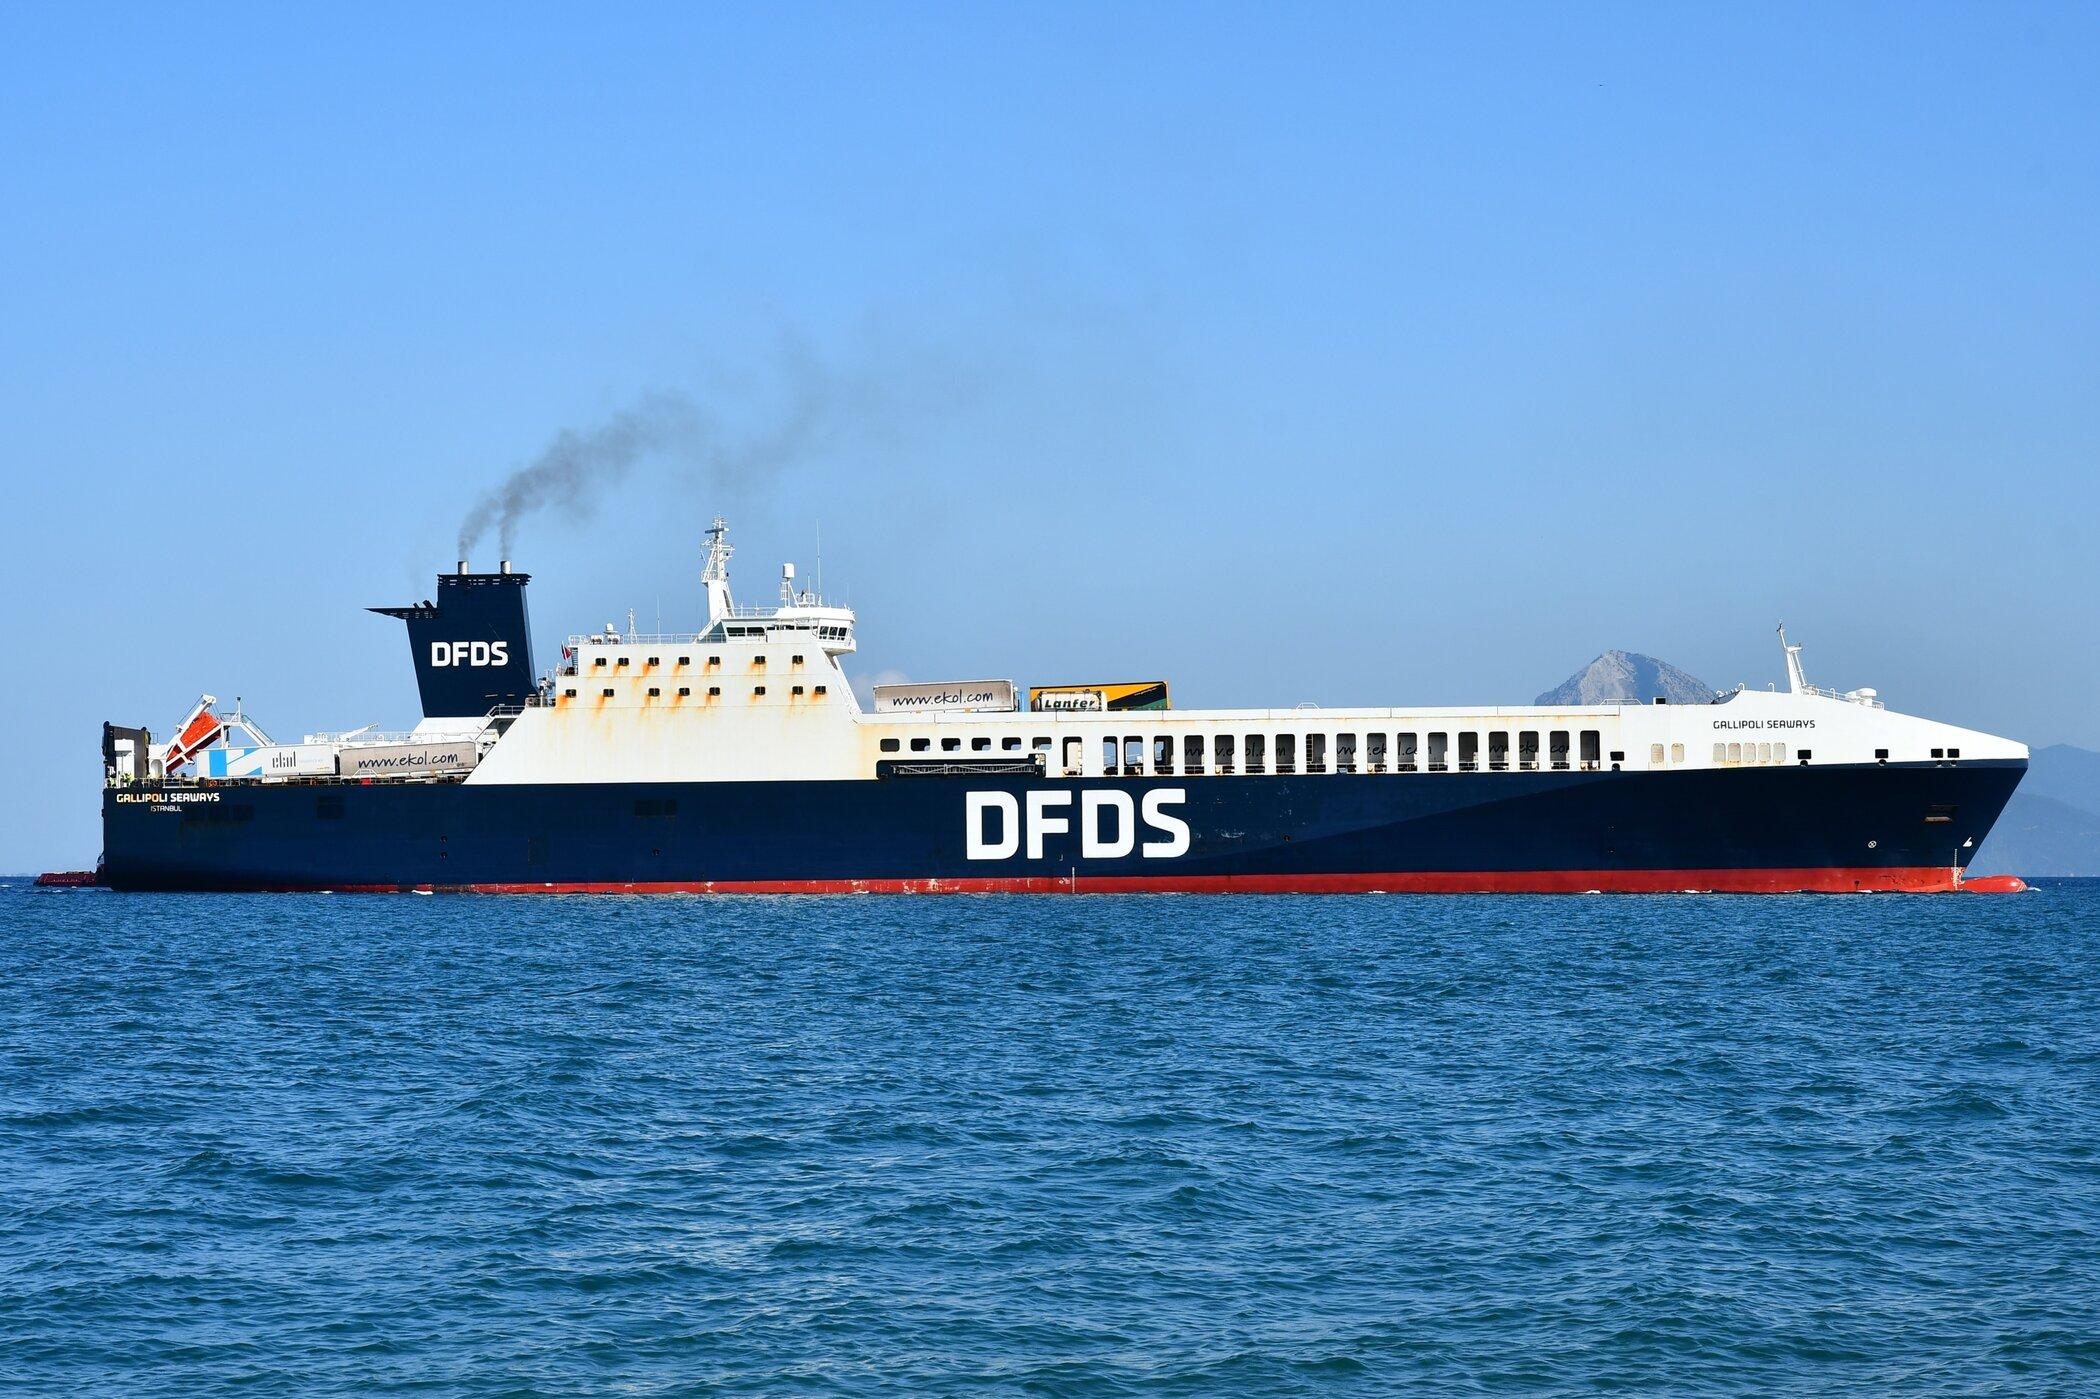 Gallipoli Seaways_28-05-21_Patras_2